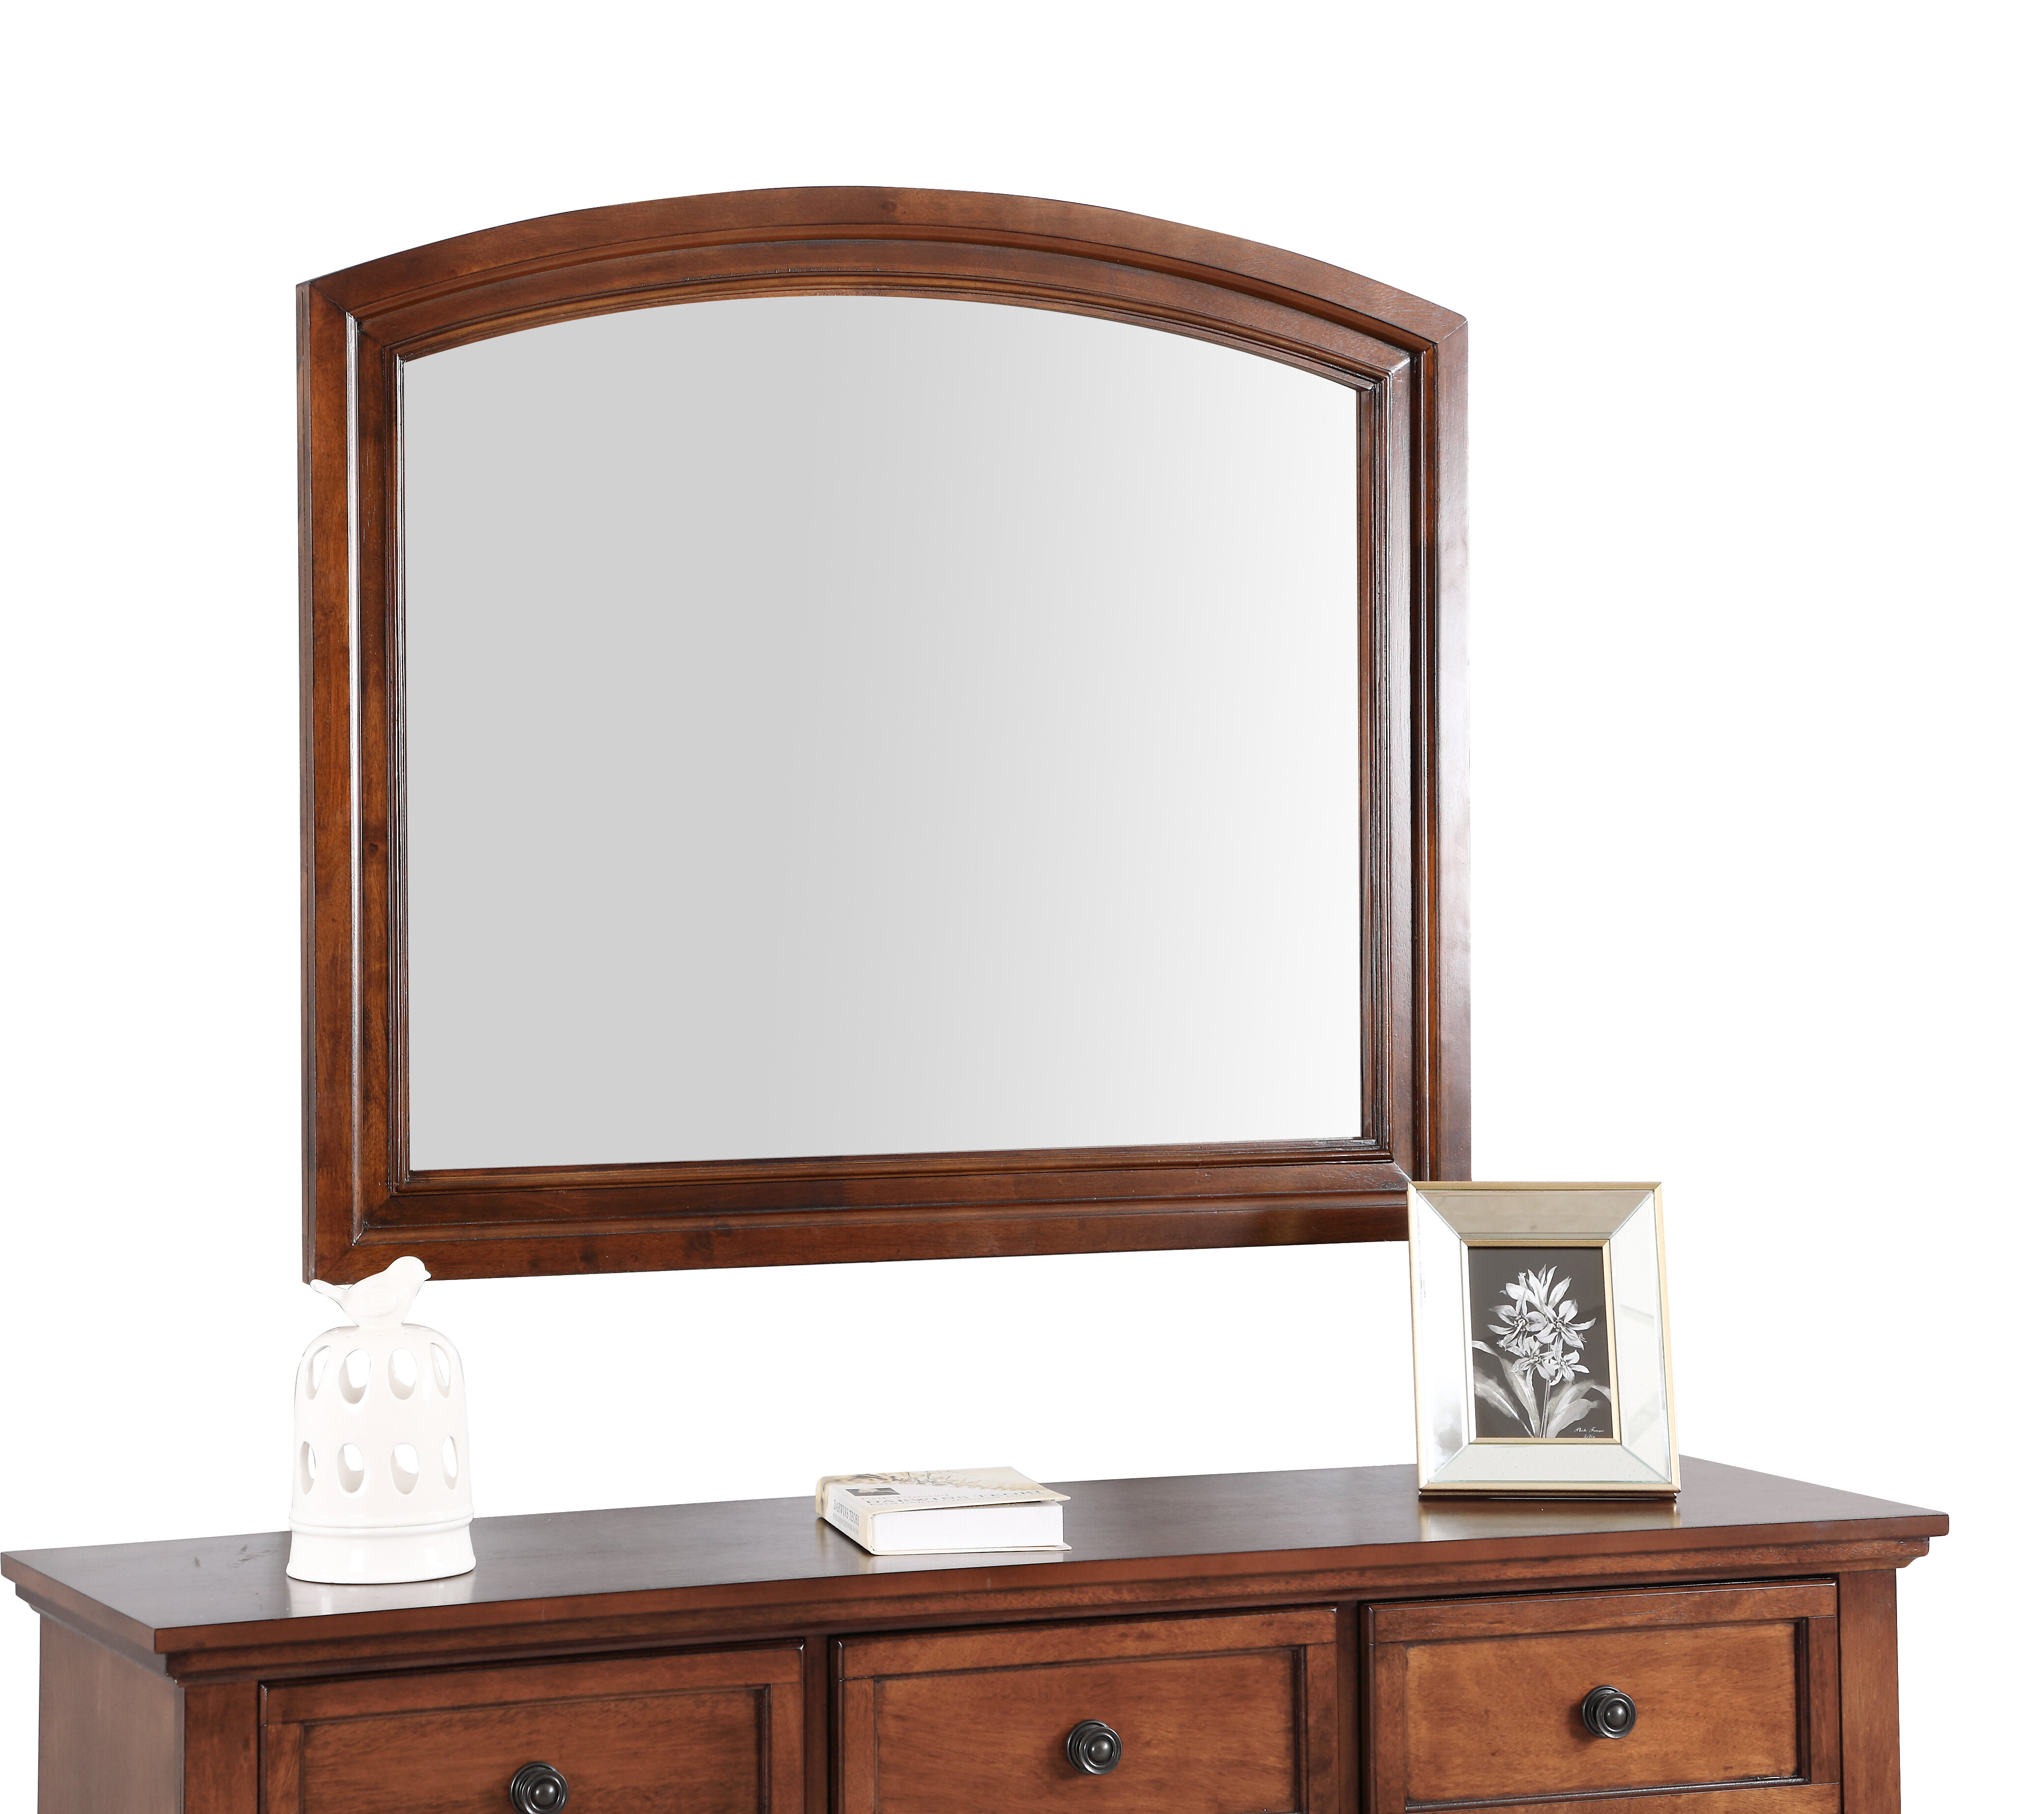 Dresser Mirror Charlton Home Mirrors You Ll Love In 2021 Wayfair